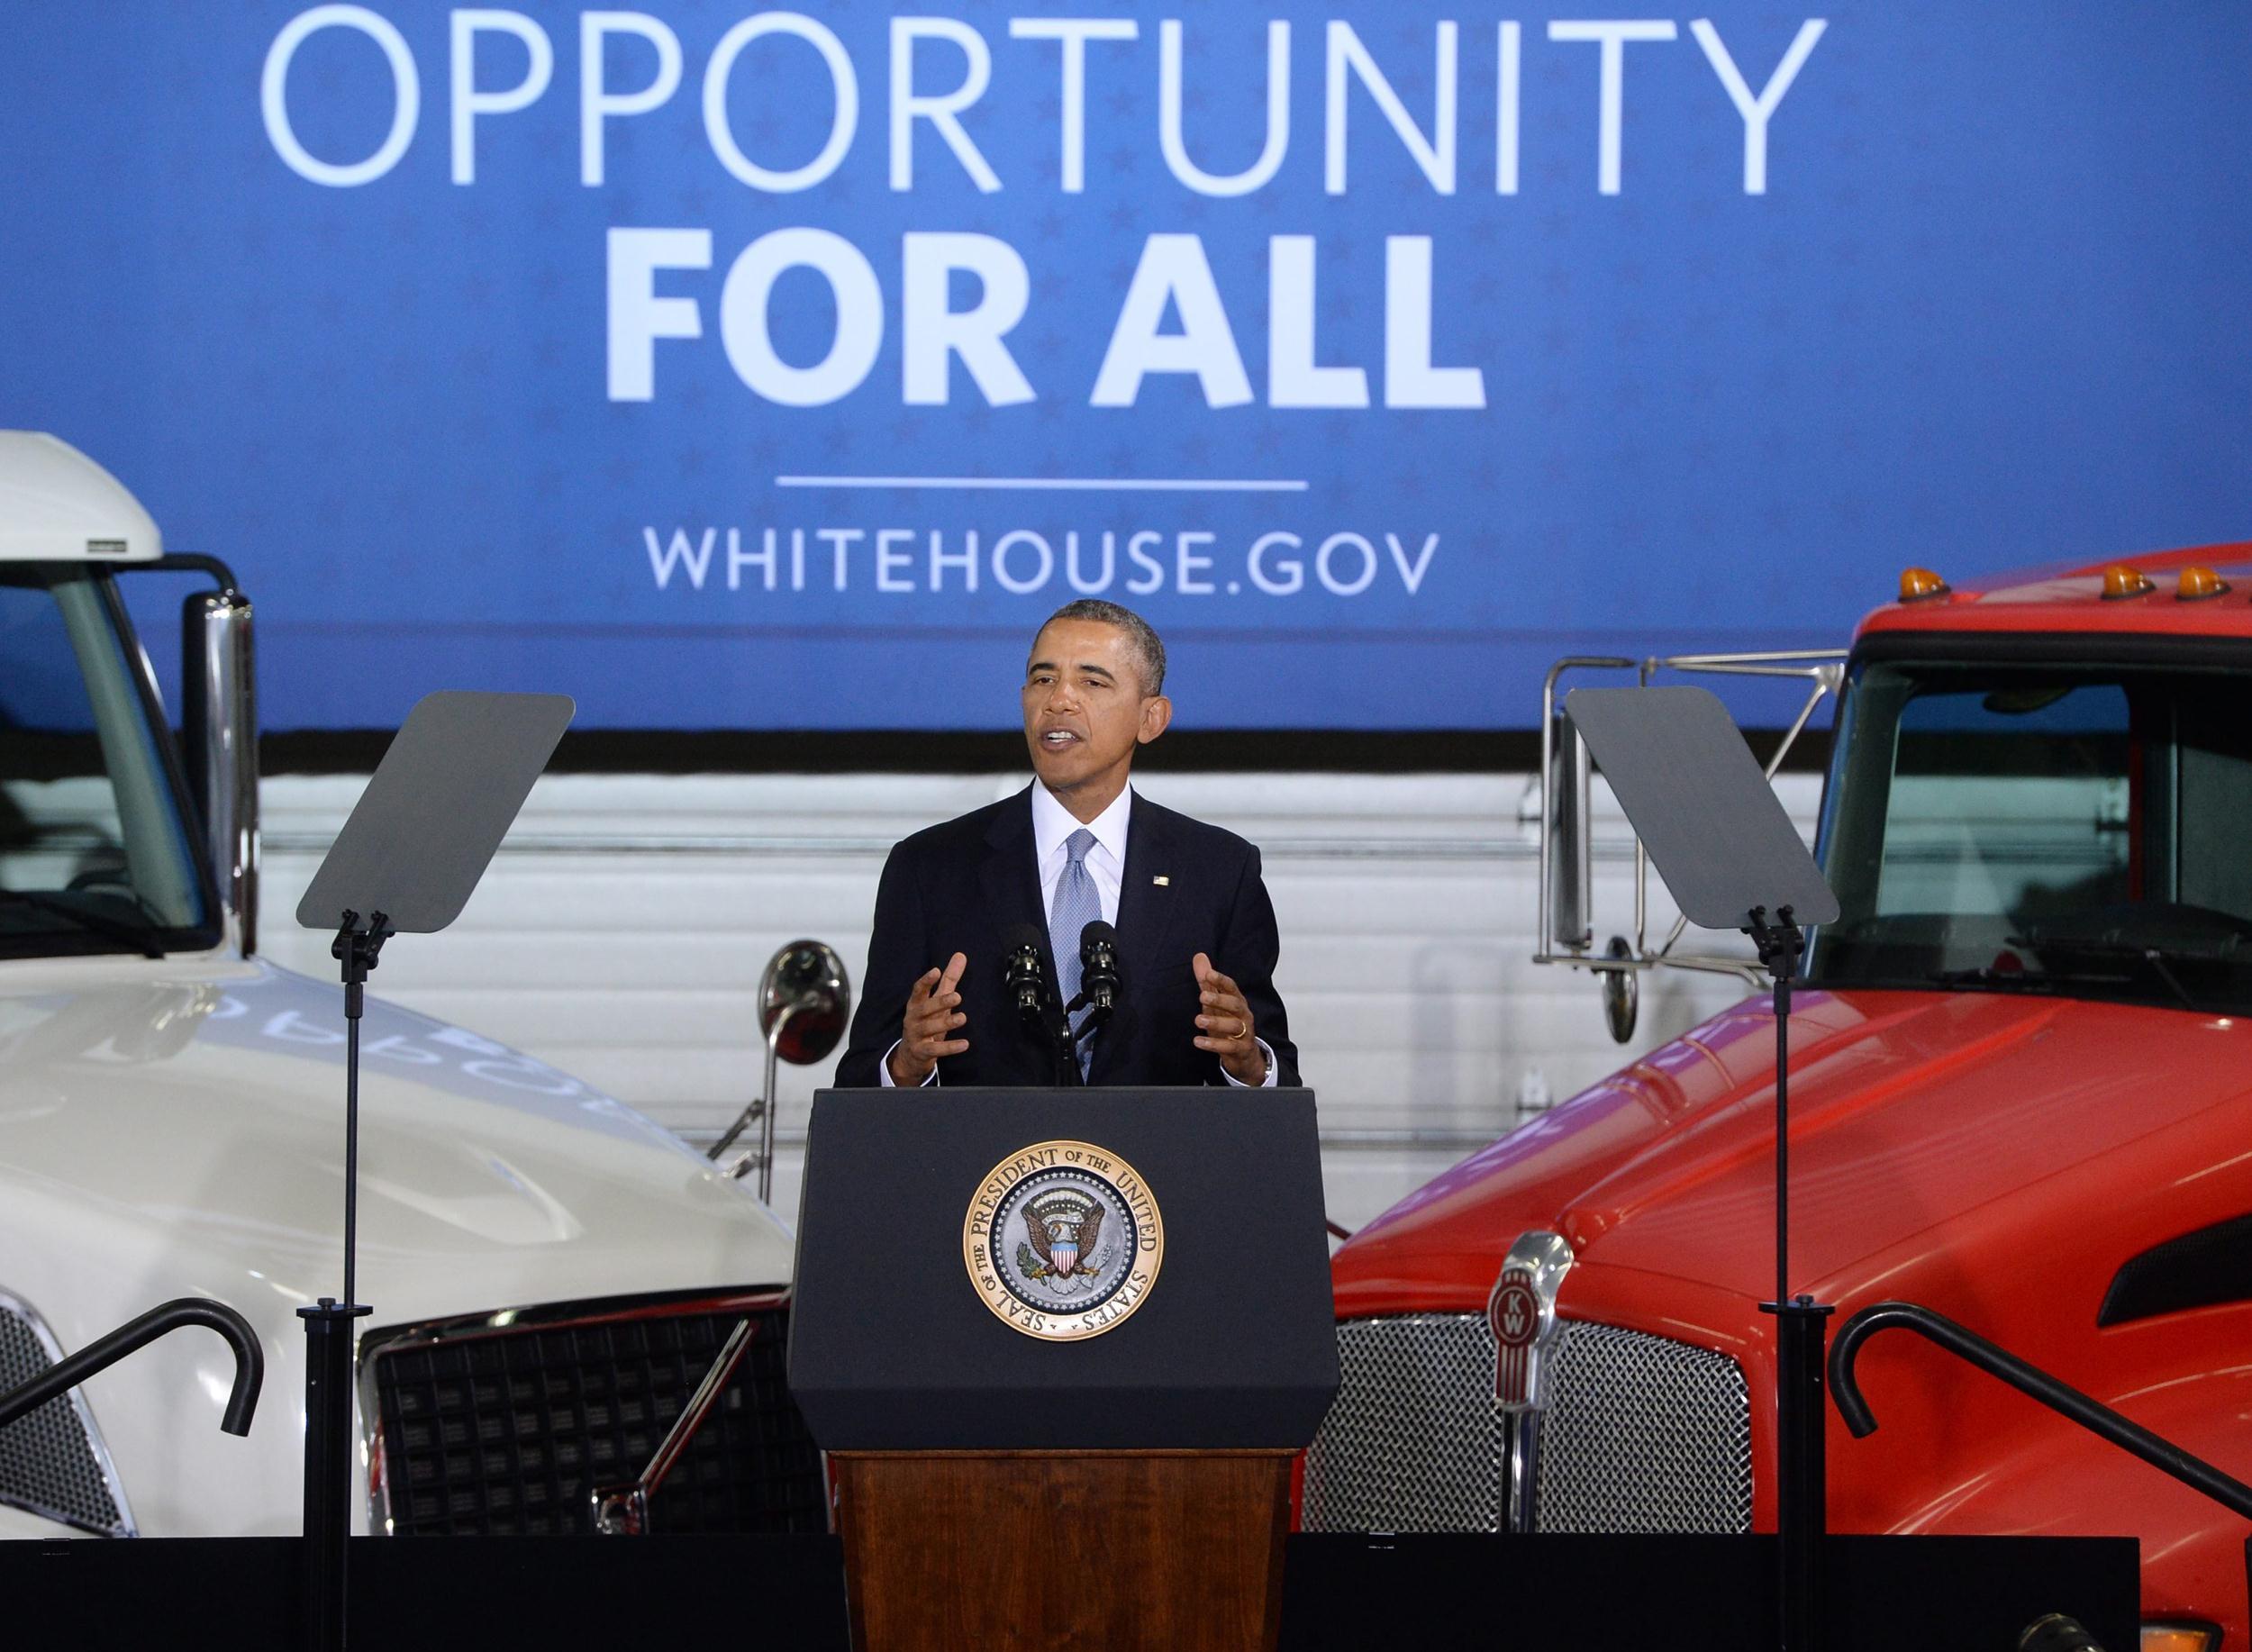 Image: US President Barack Obama at the Safeway Distribution Center in Upper Marlboro